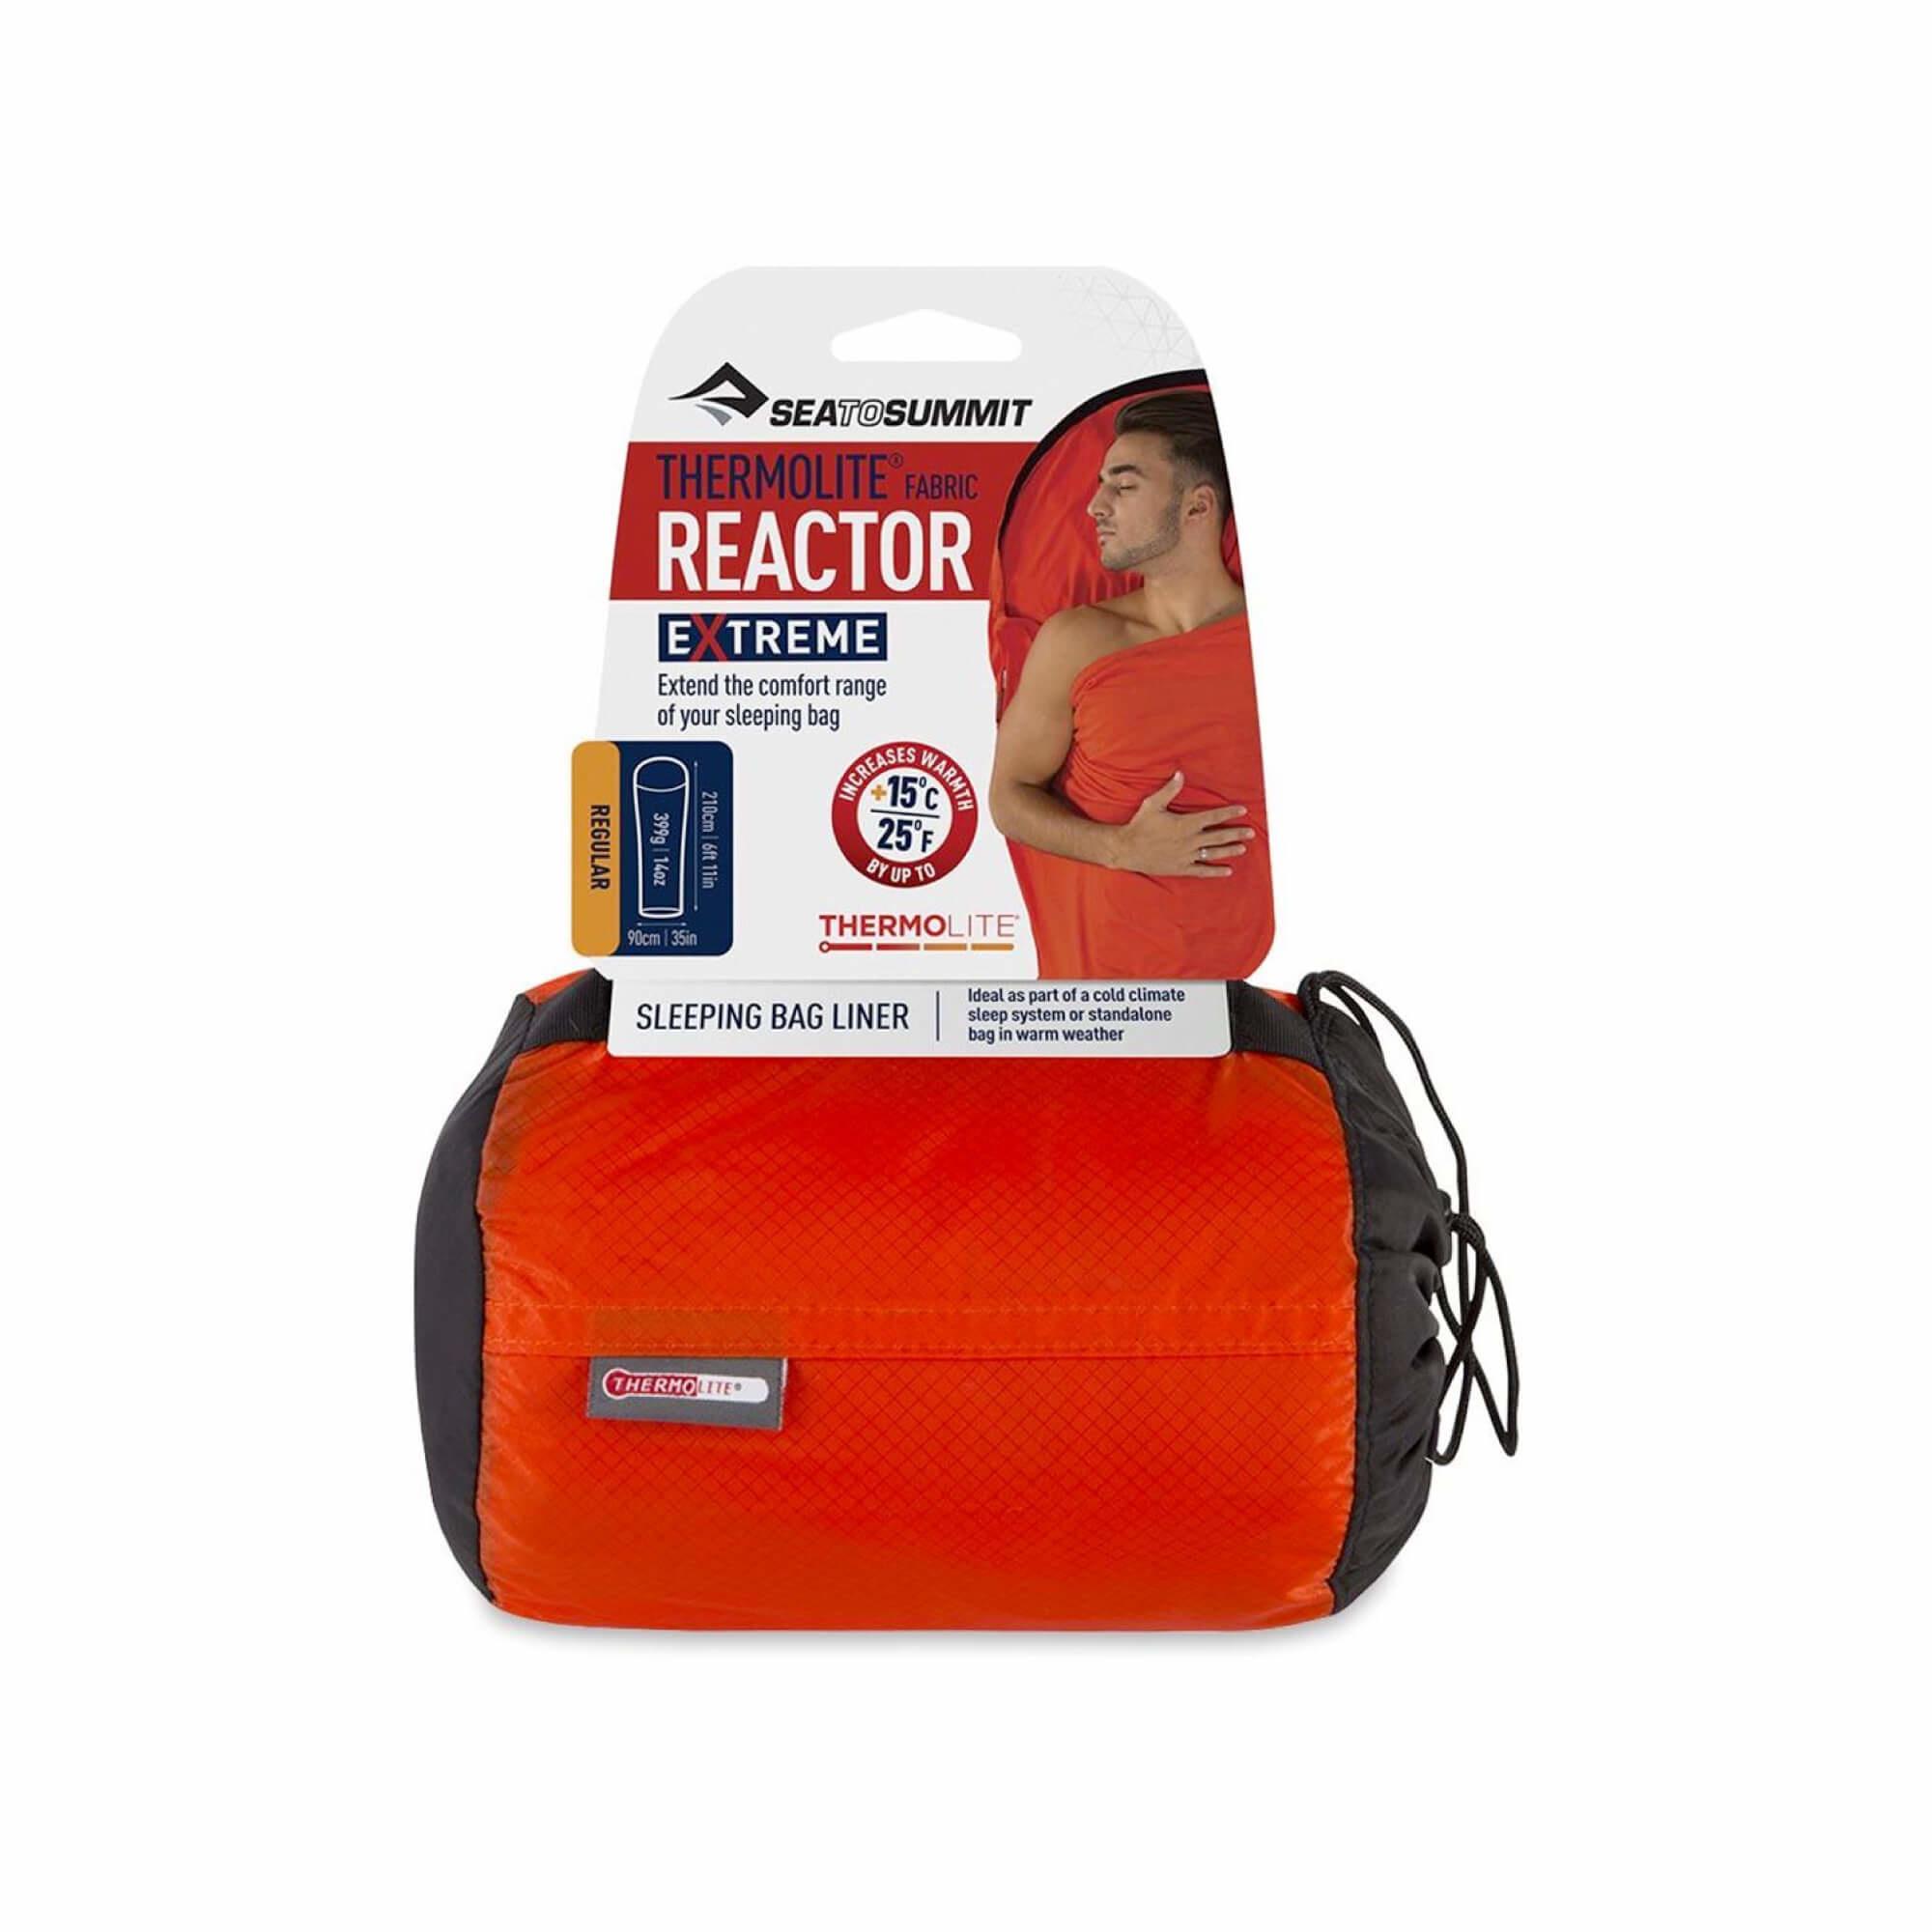 Sleeping Bag Reactor Thermolite Extreme-2